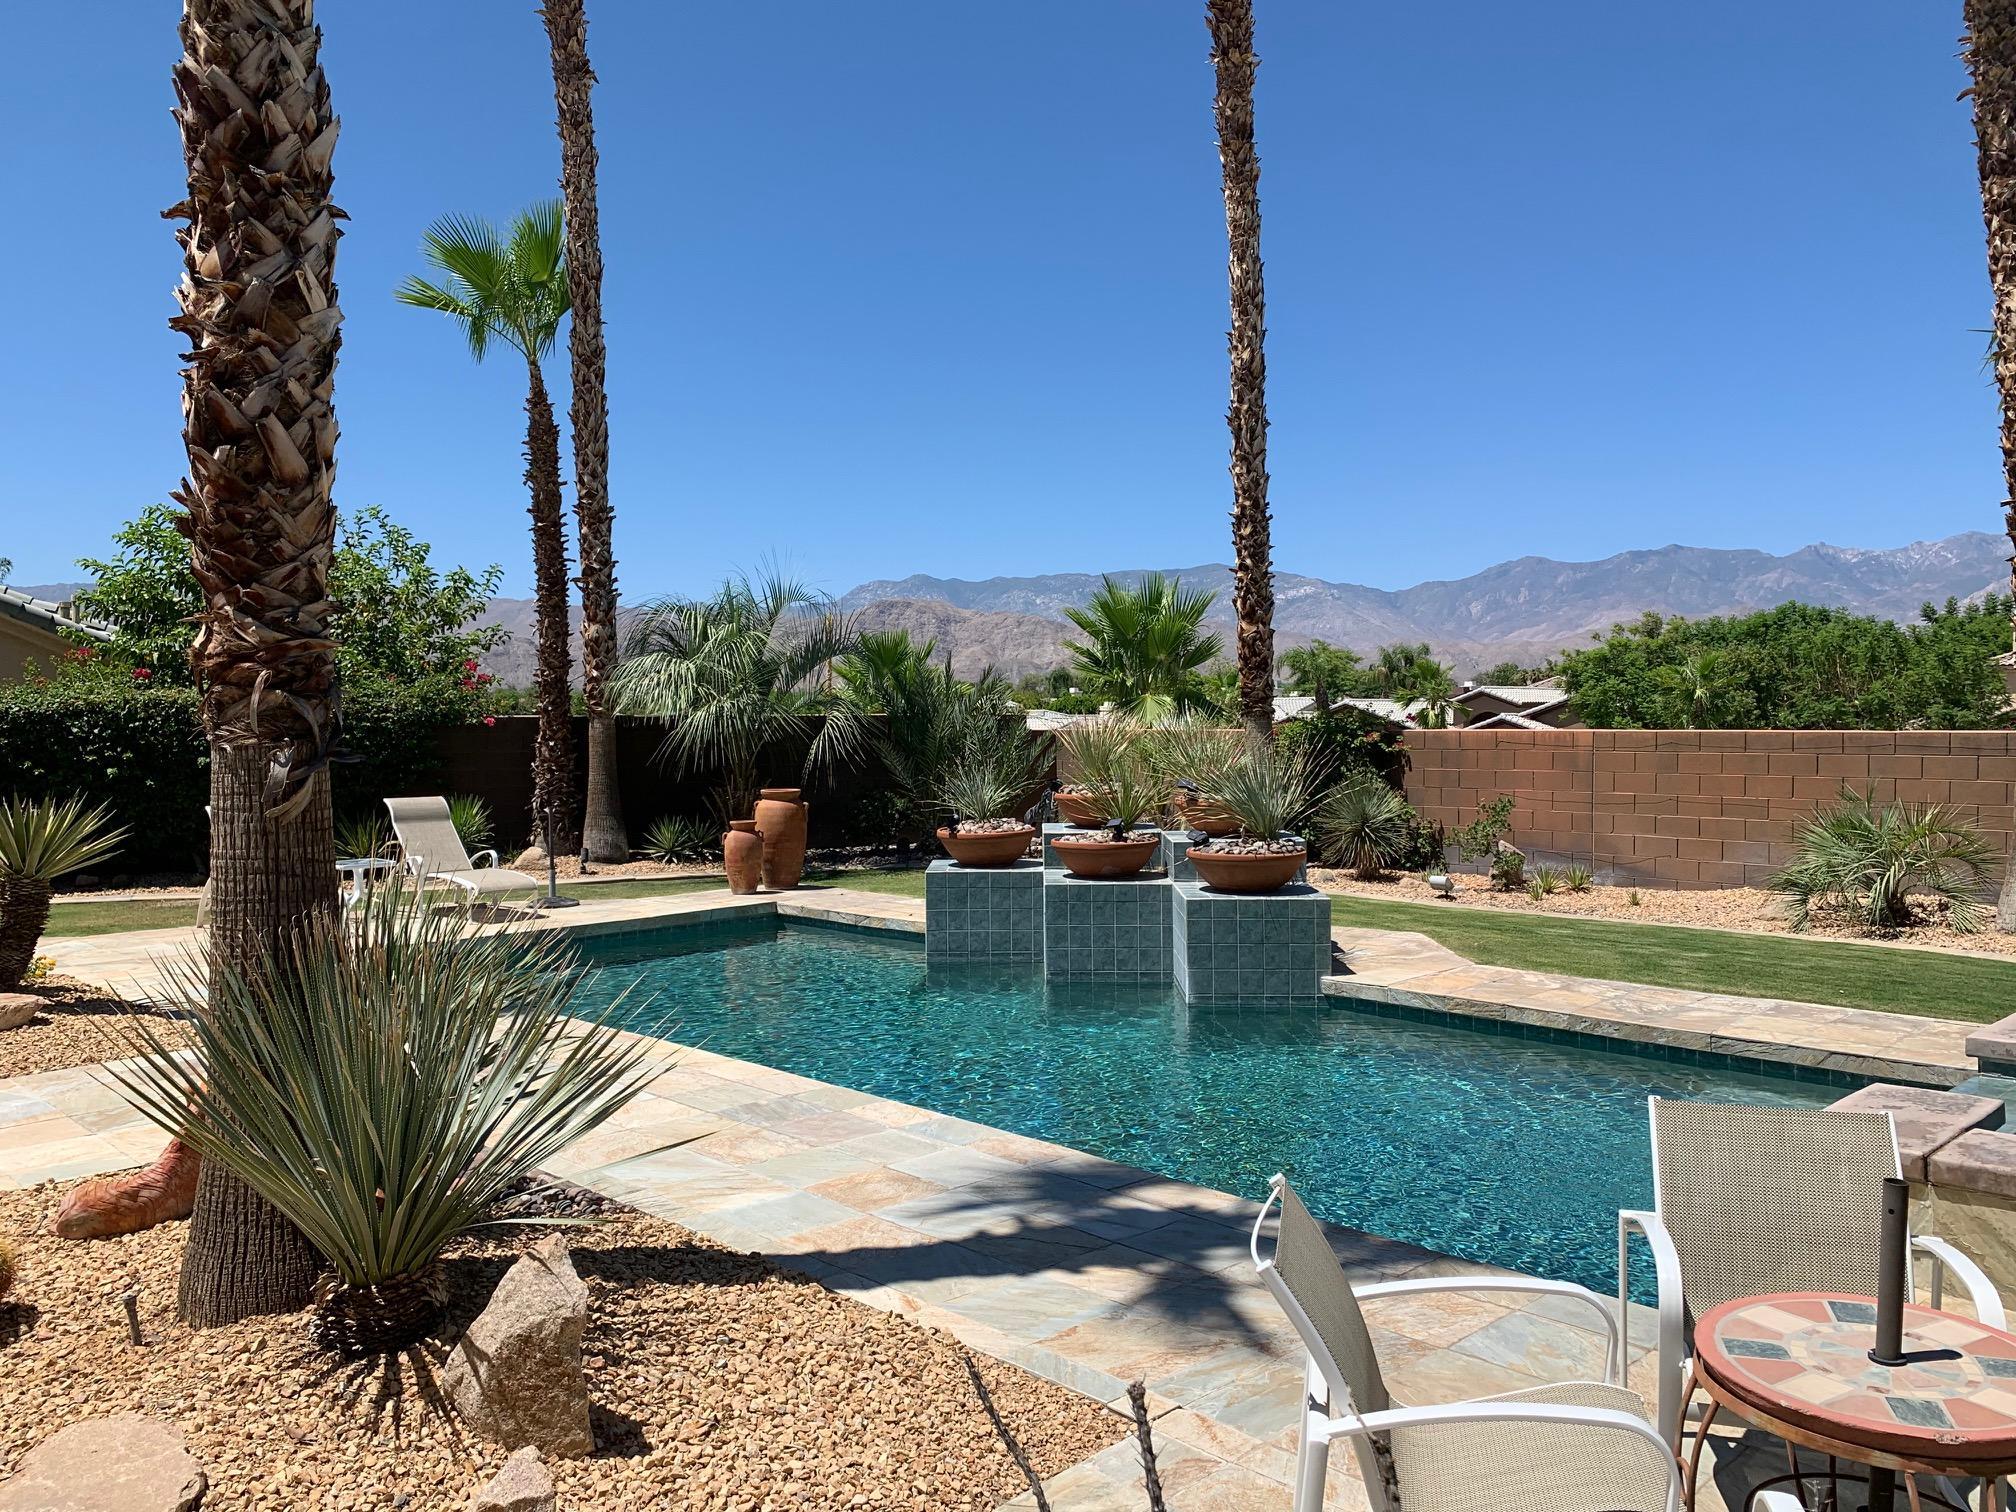 Photo of 8 Excalibur Court, Rancho Mirage, CA 92270